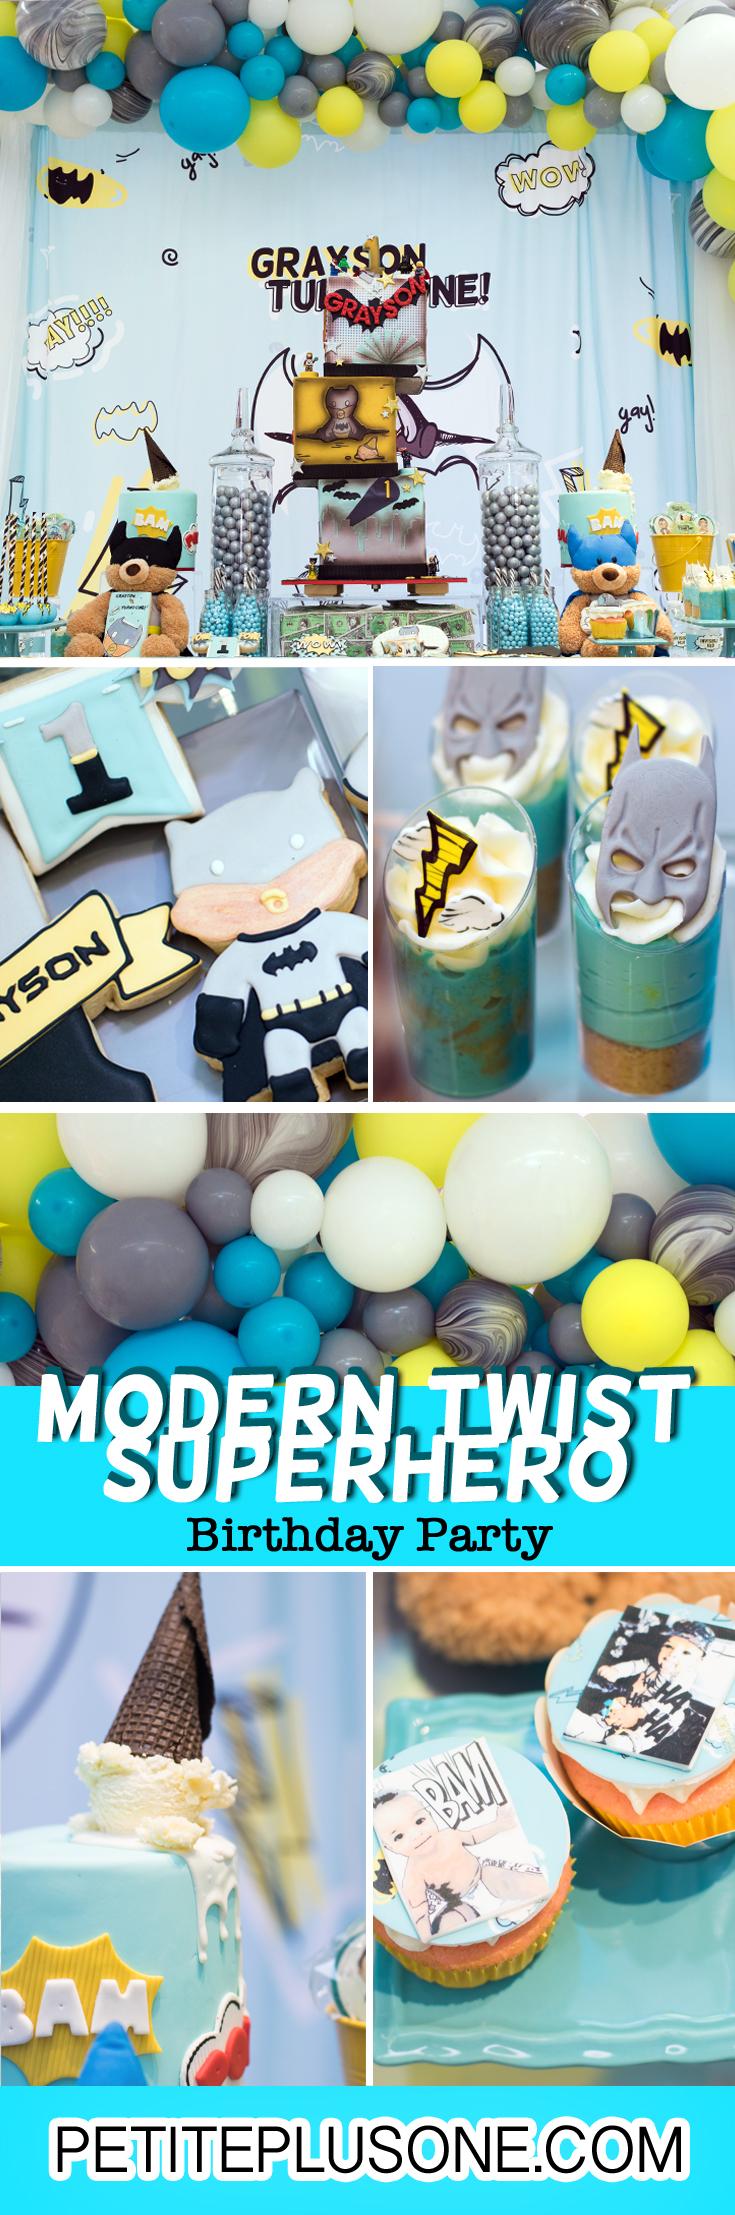 modern_superhero_party.jpg